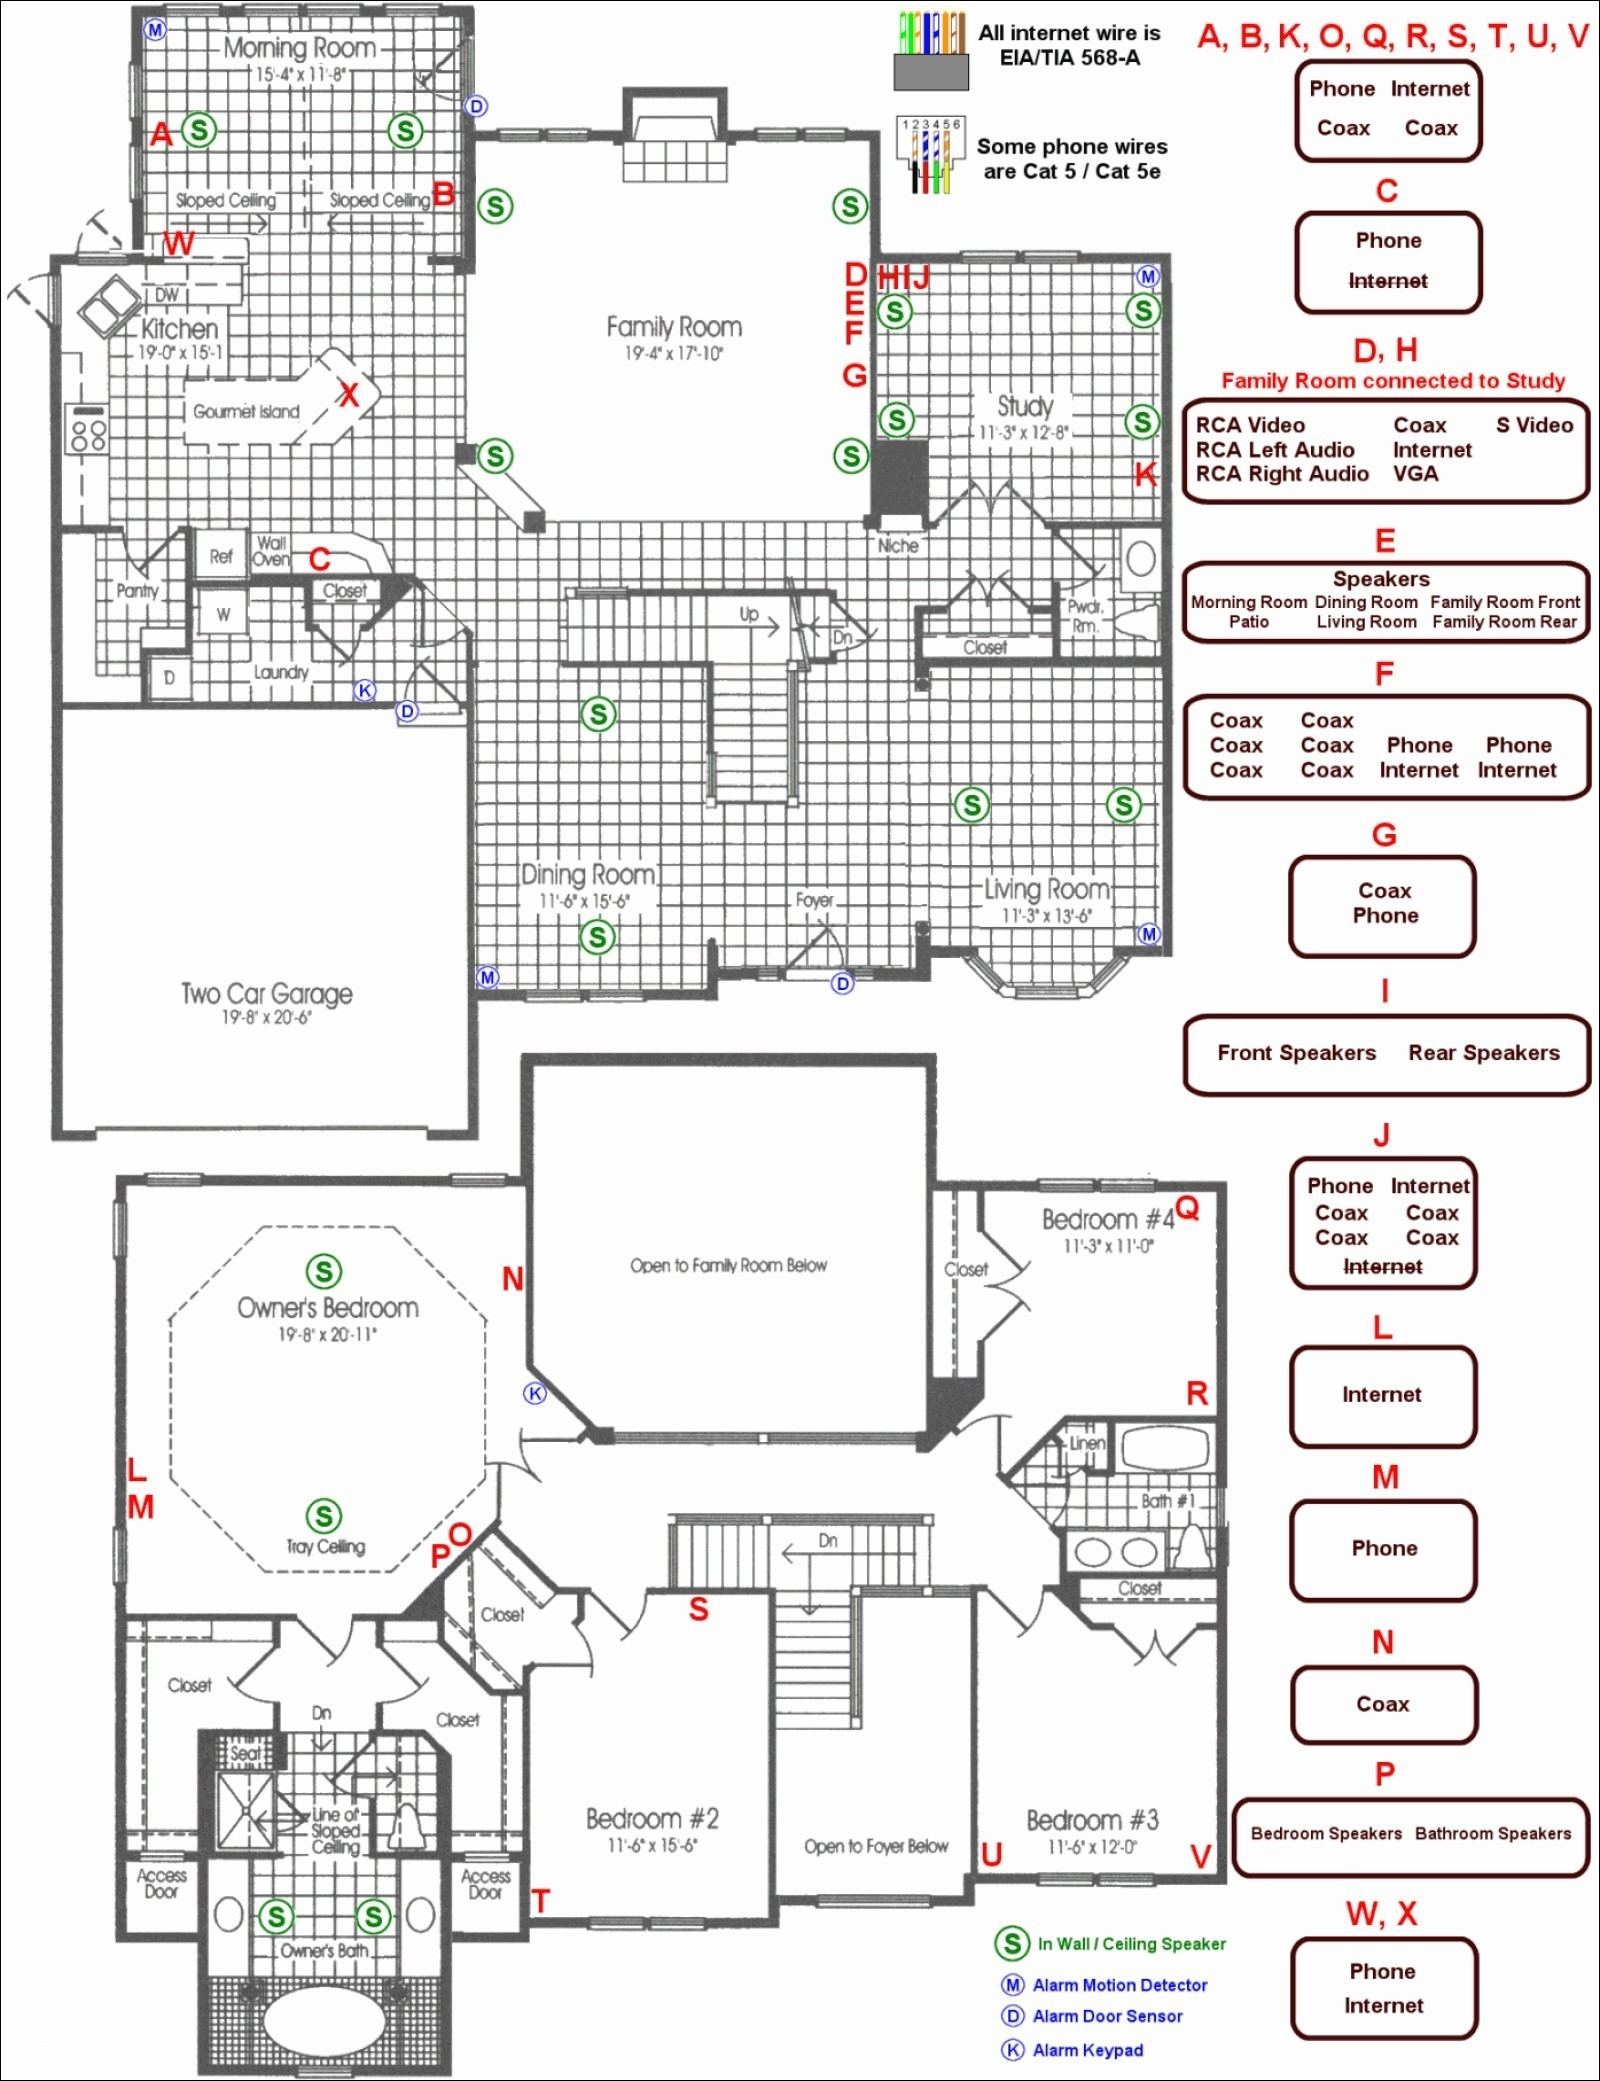 ge washer wiring diagram Collection-Ge Washer Wiring Diagram Aktive Crossoverfrequenzweiche Mit Max4478 360customs Crossover Schematic Rev 0d Wiring Lighting 9-f